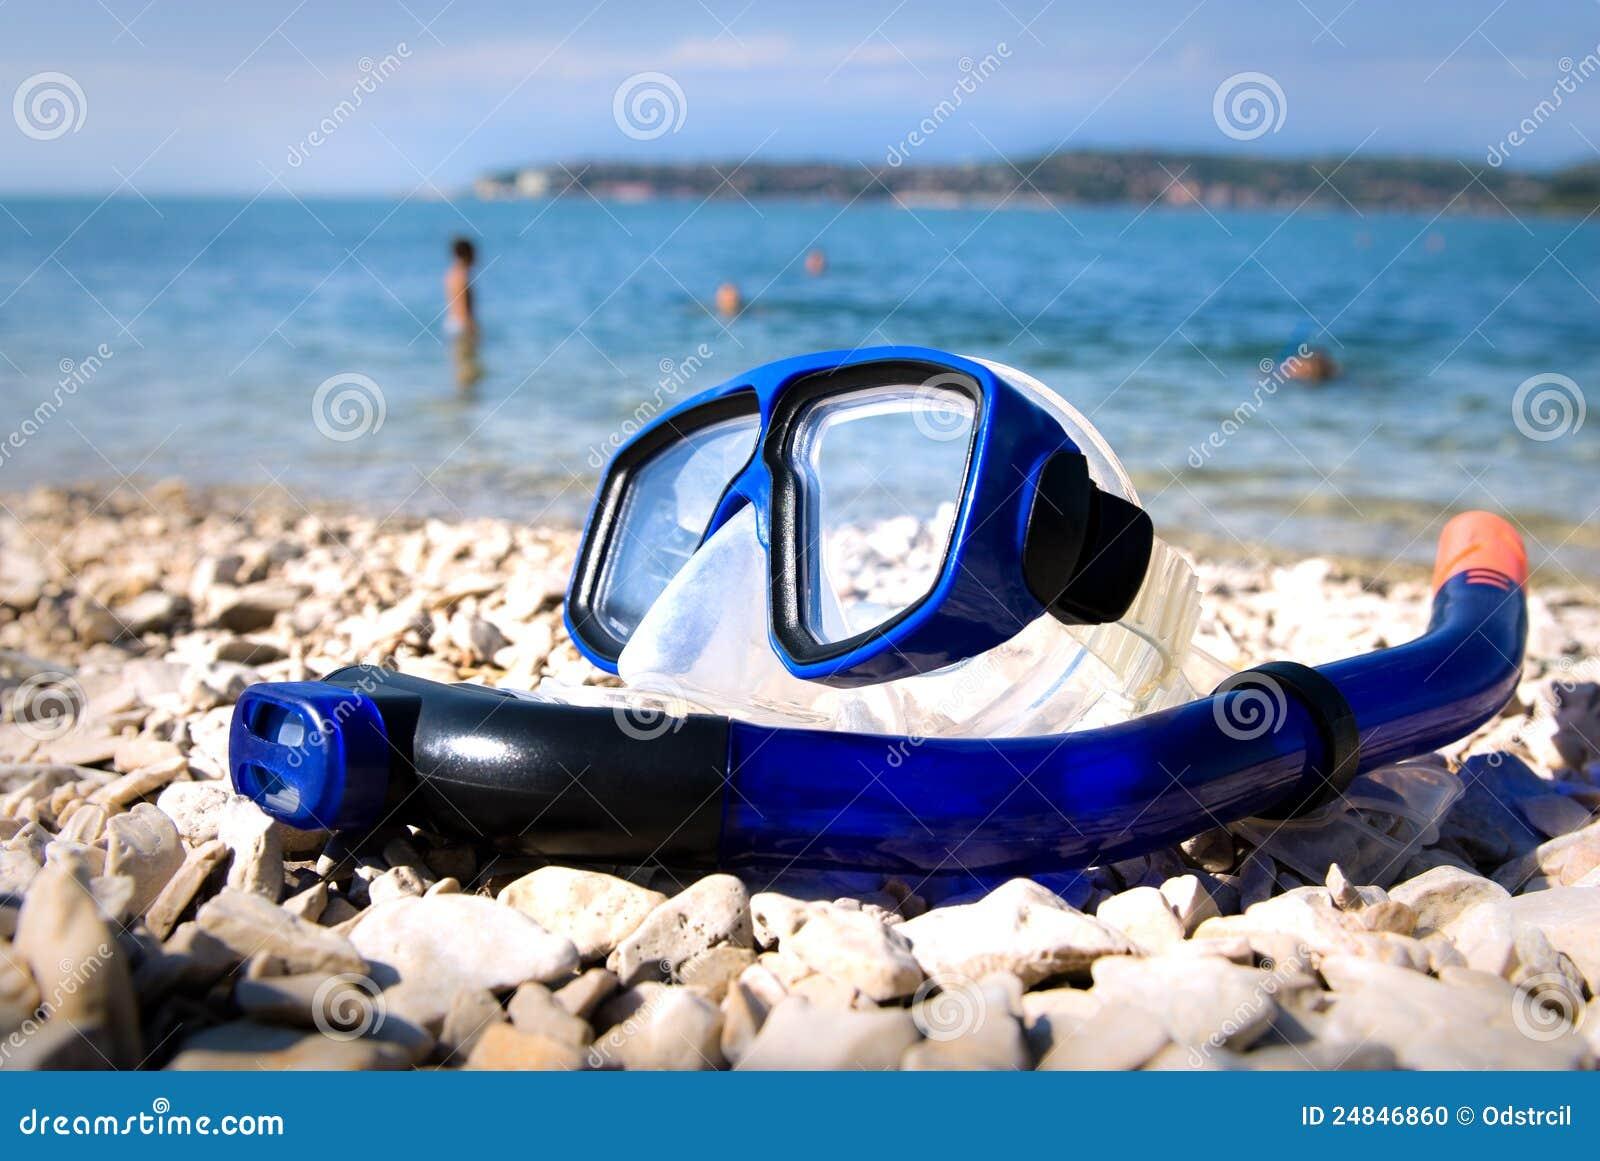 beach goggles  Blue Goggles On The Beach Sand Stock Photo - Image: 68613228